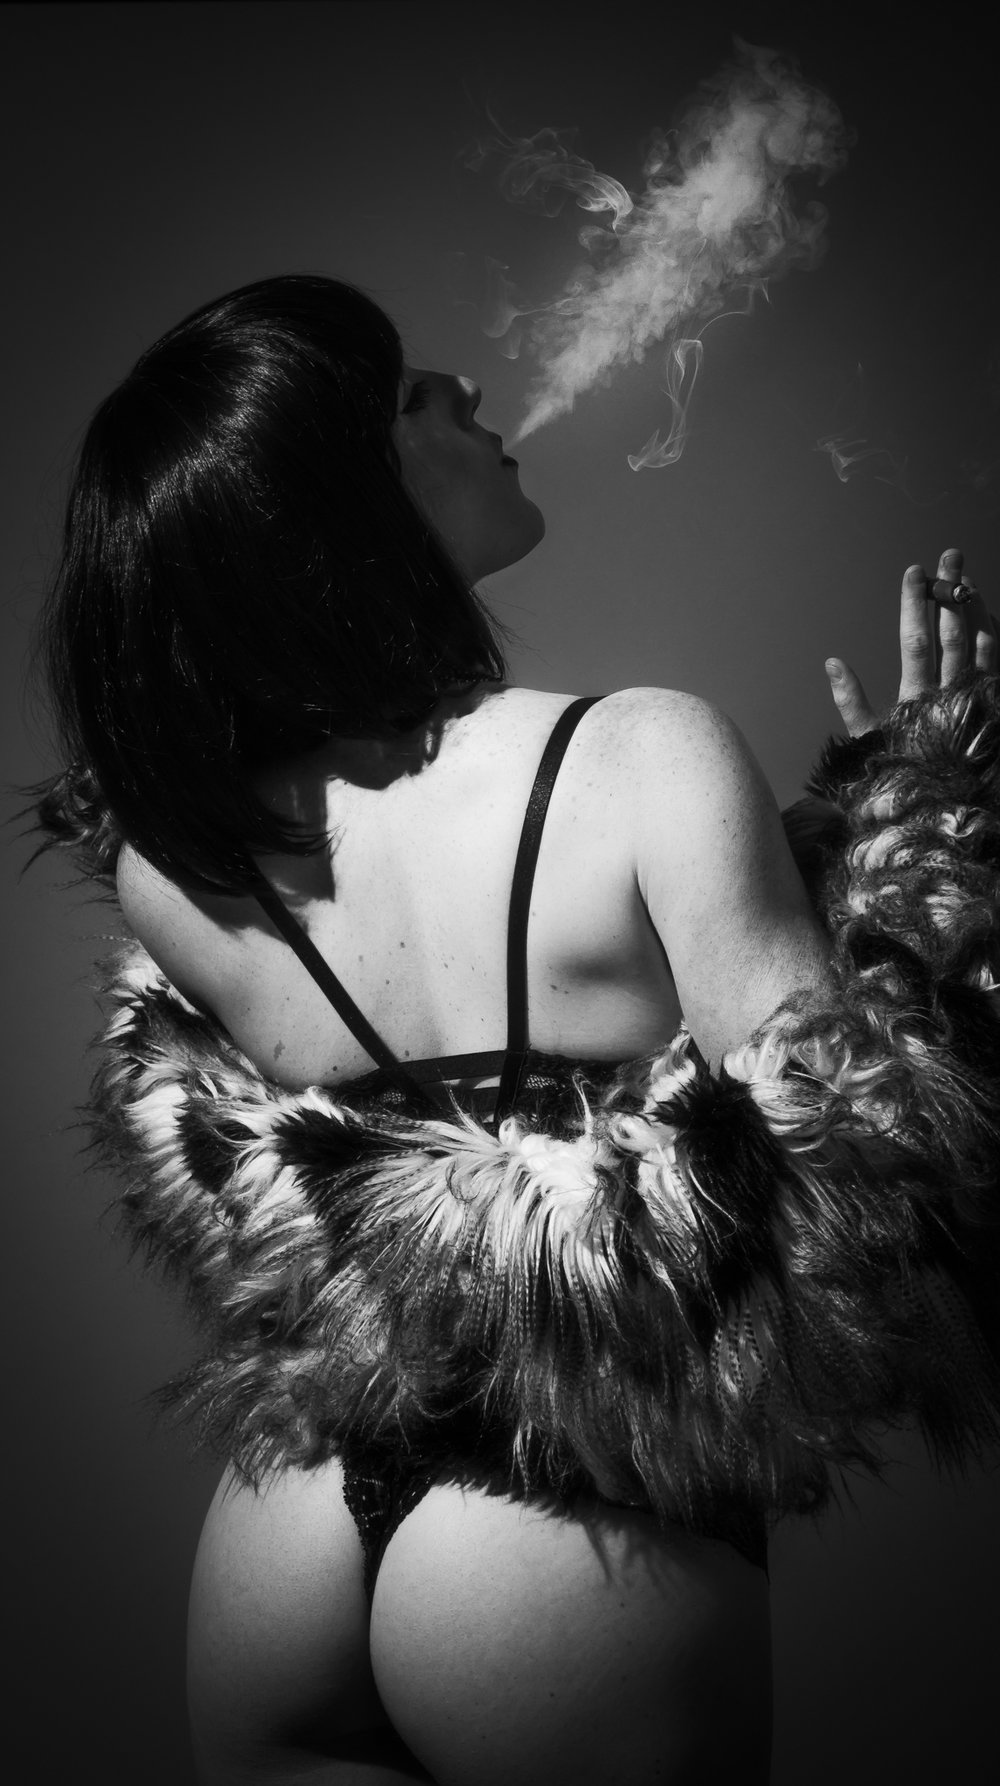 20160504-Esther-Dame-Dynamite-0931.jpg